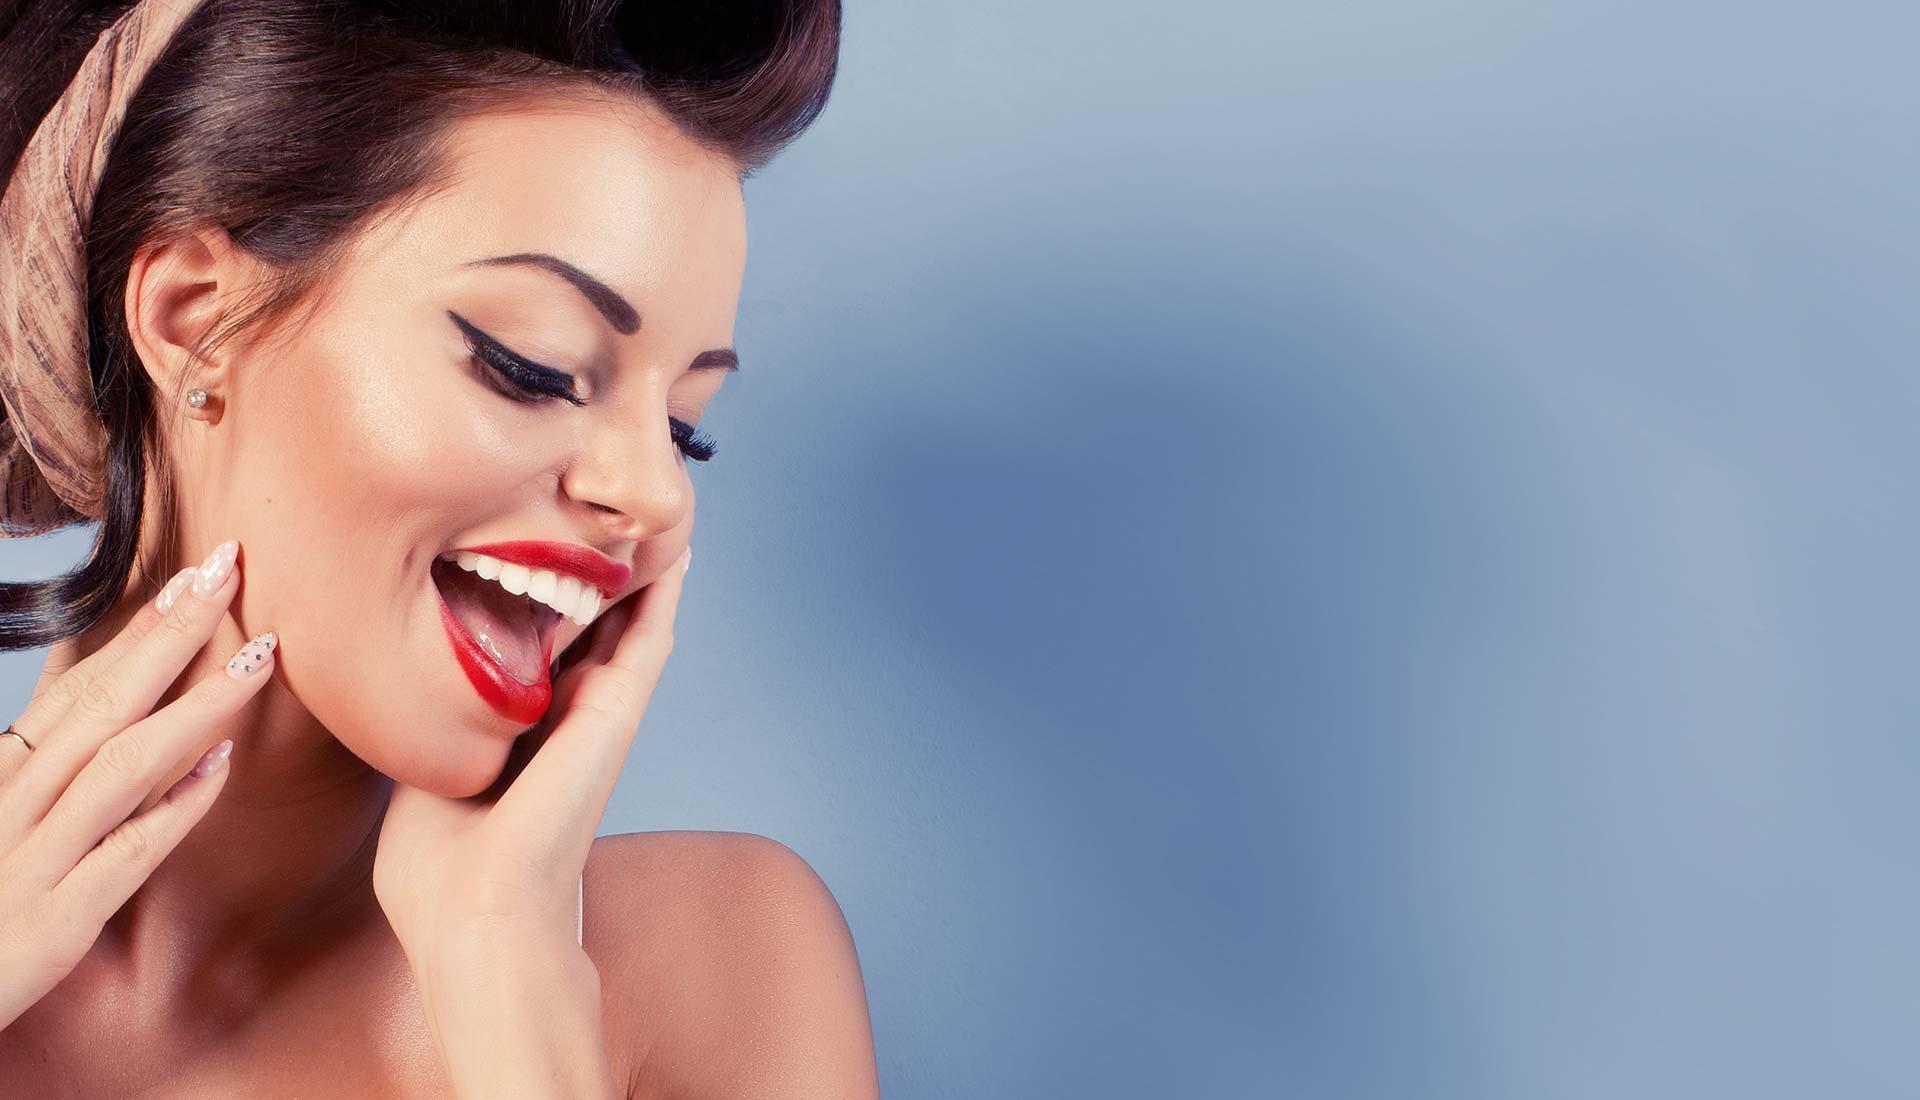 shiny smile